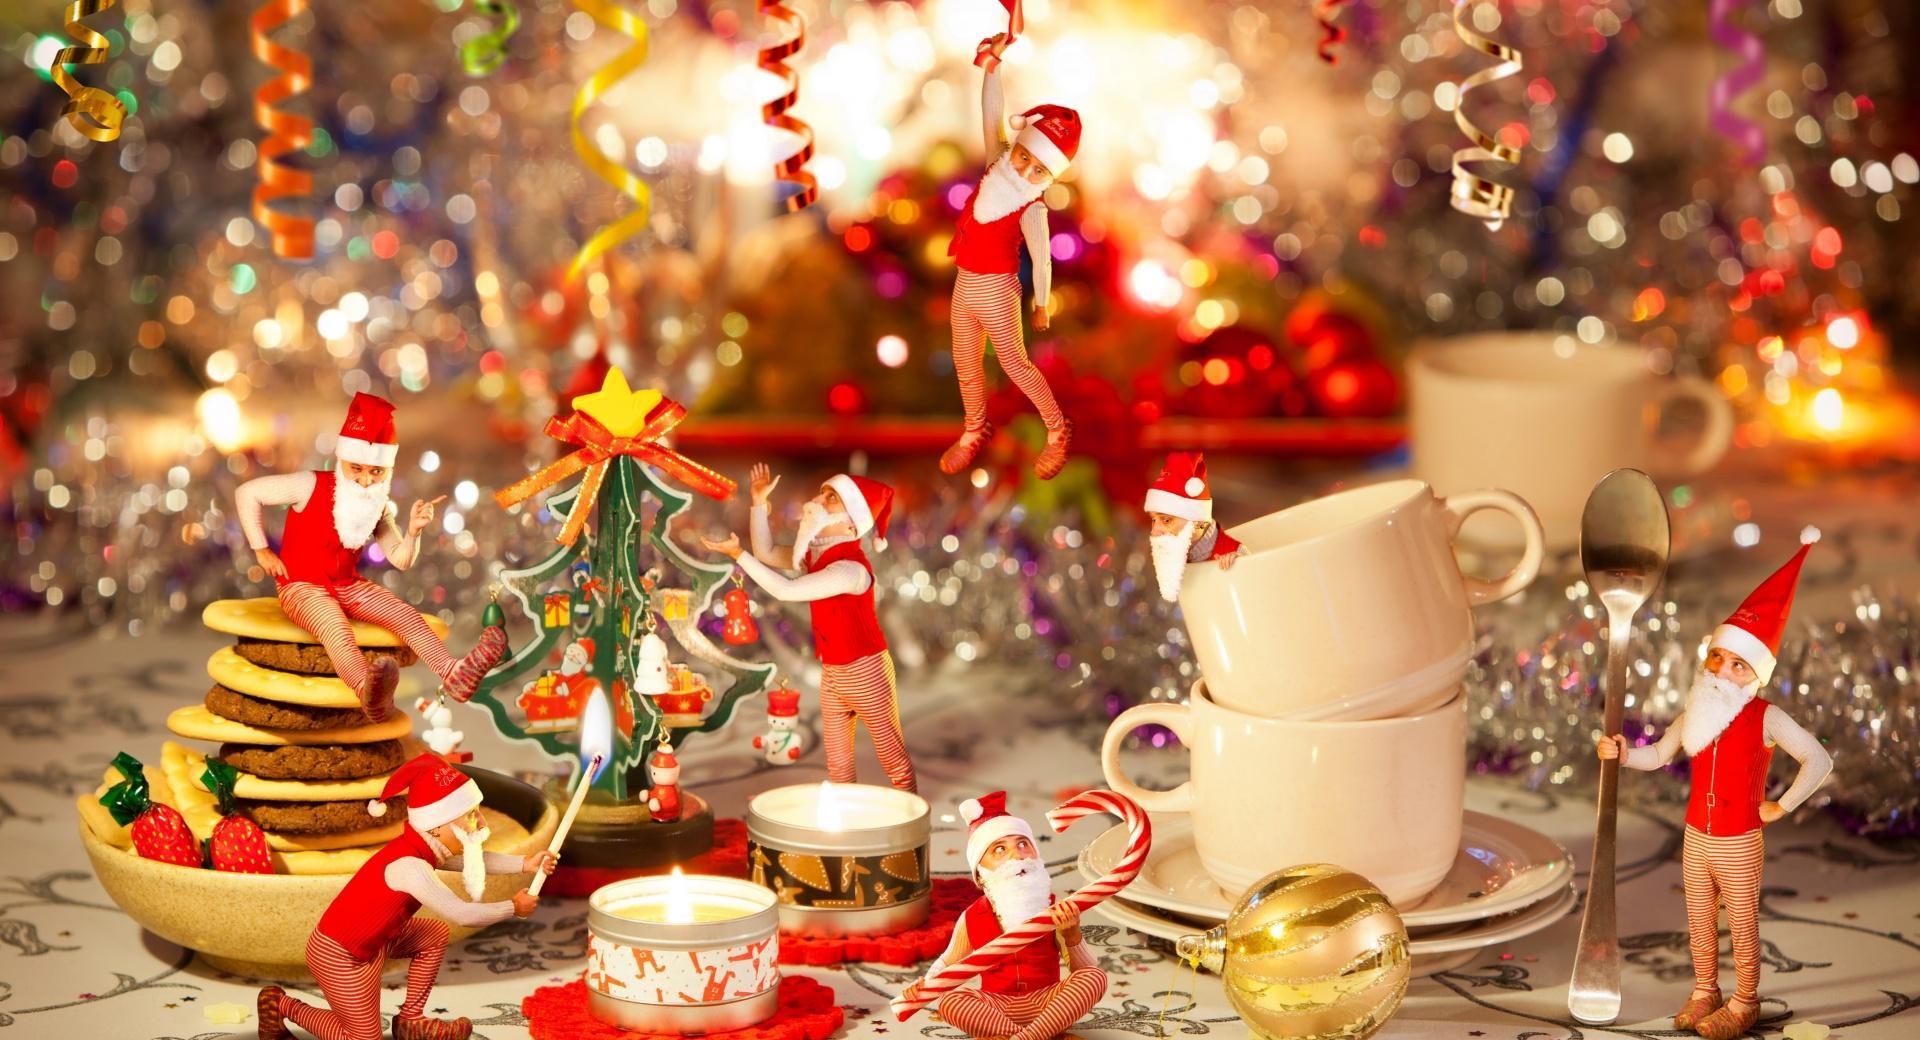 Christmas Fun wallpapers HD quality